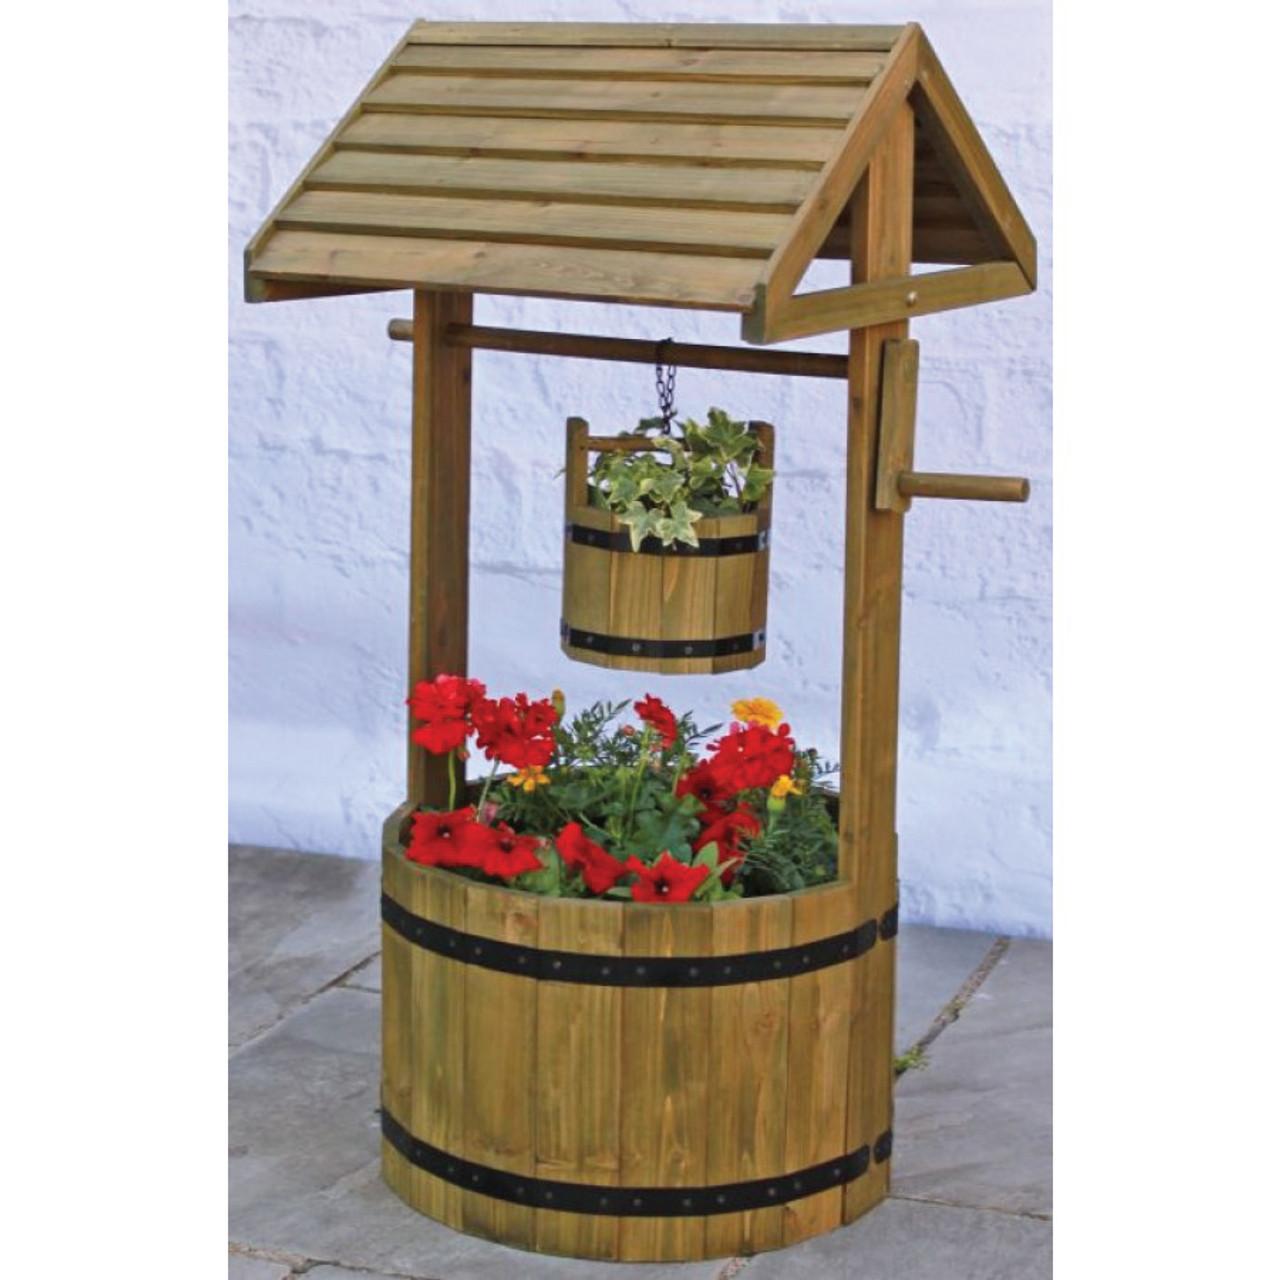 Wooden Wishing Well Planter Mr Middleton Garden Shop